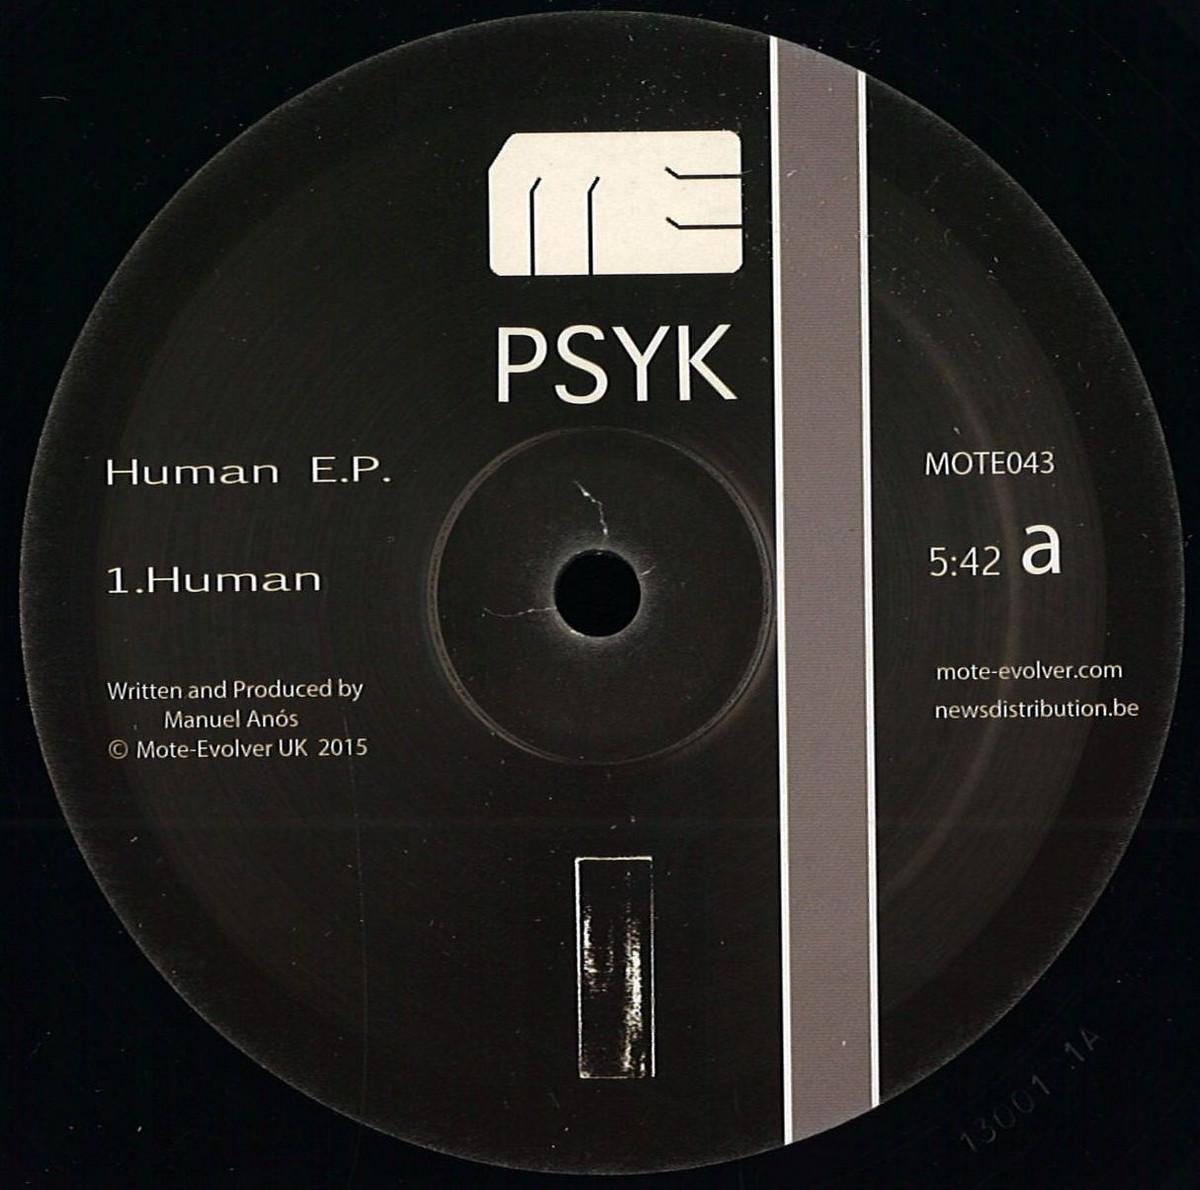 Download mp3 full flac album vinyl rip Shift - Psyk - Time Foundation (Vinyl, LP, Album)